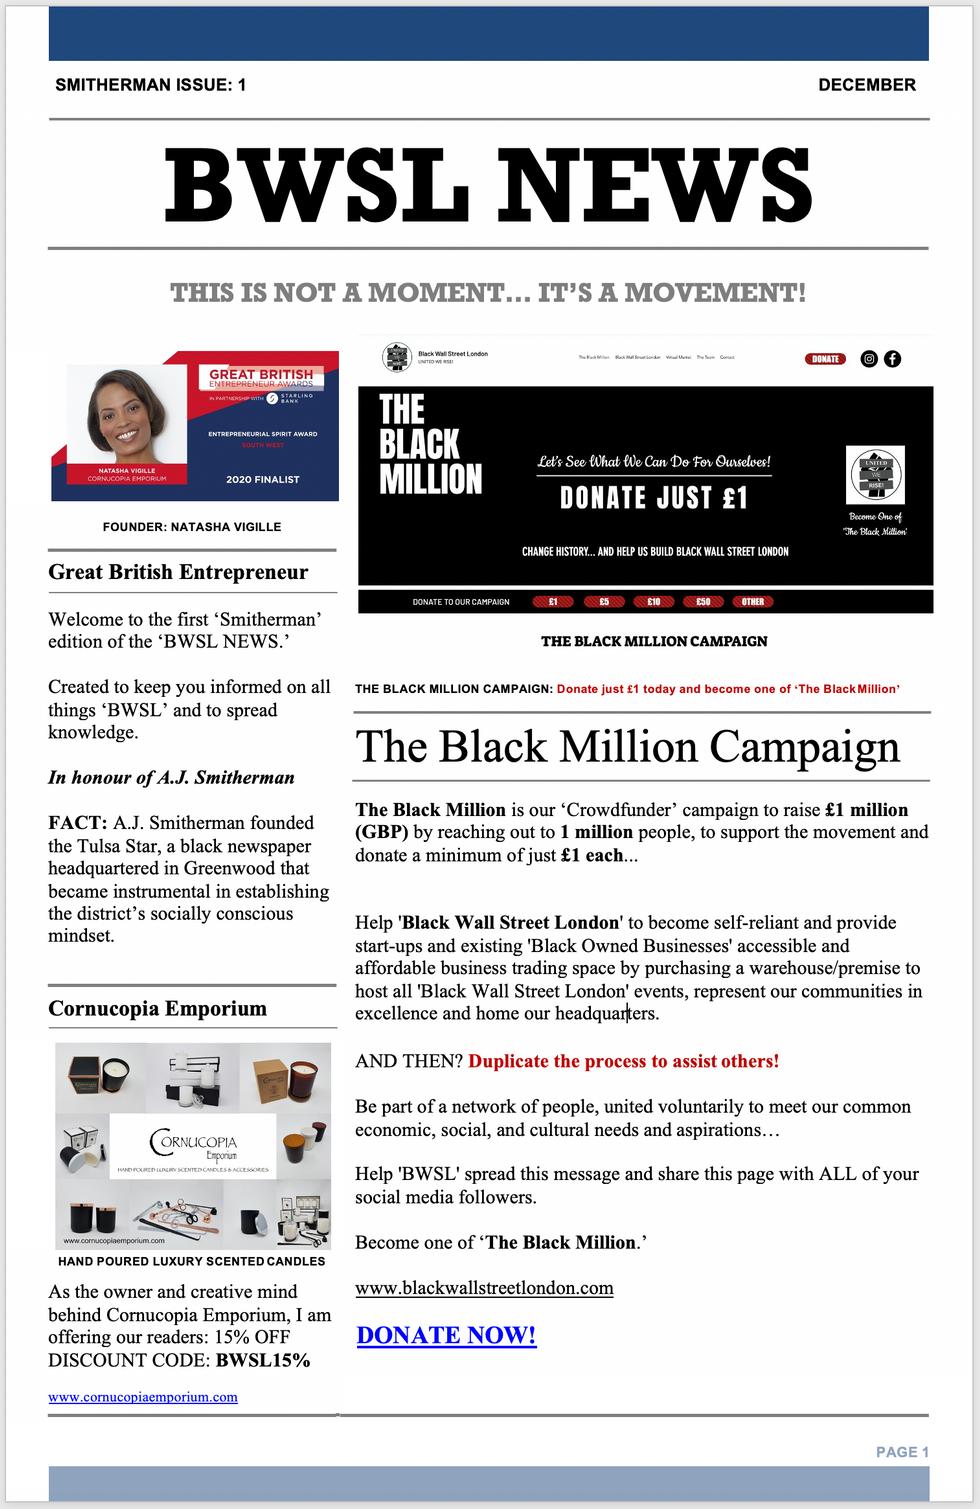 BWSL NEWS PAGE 1